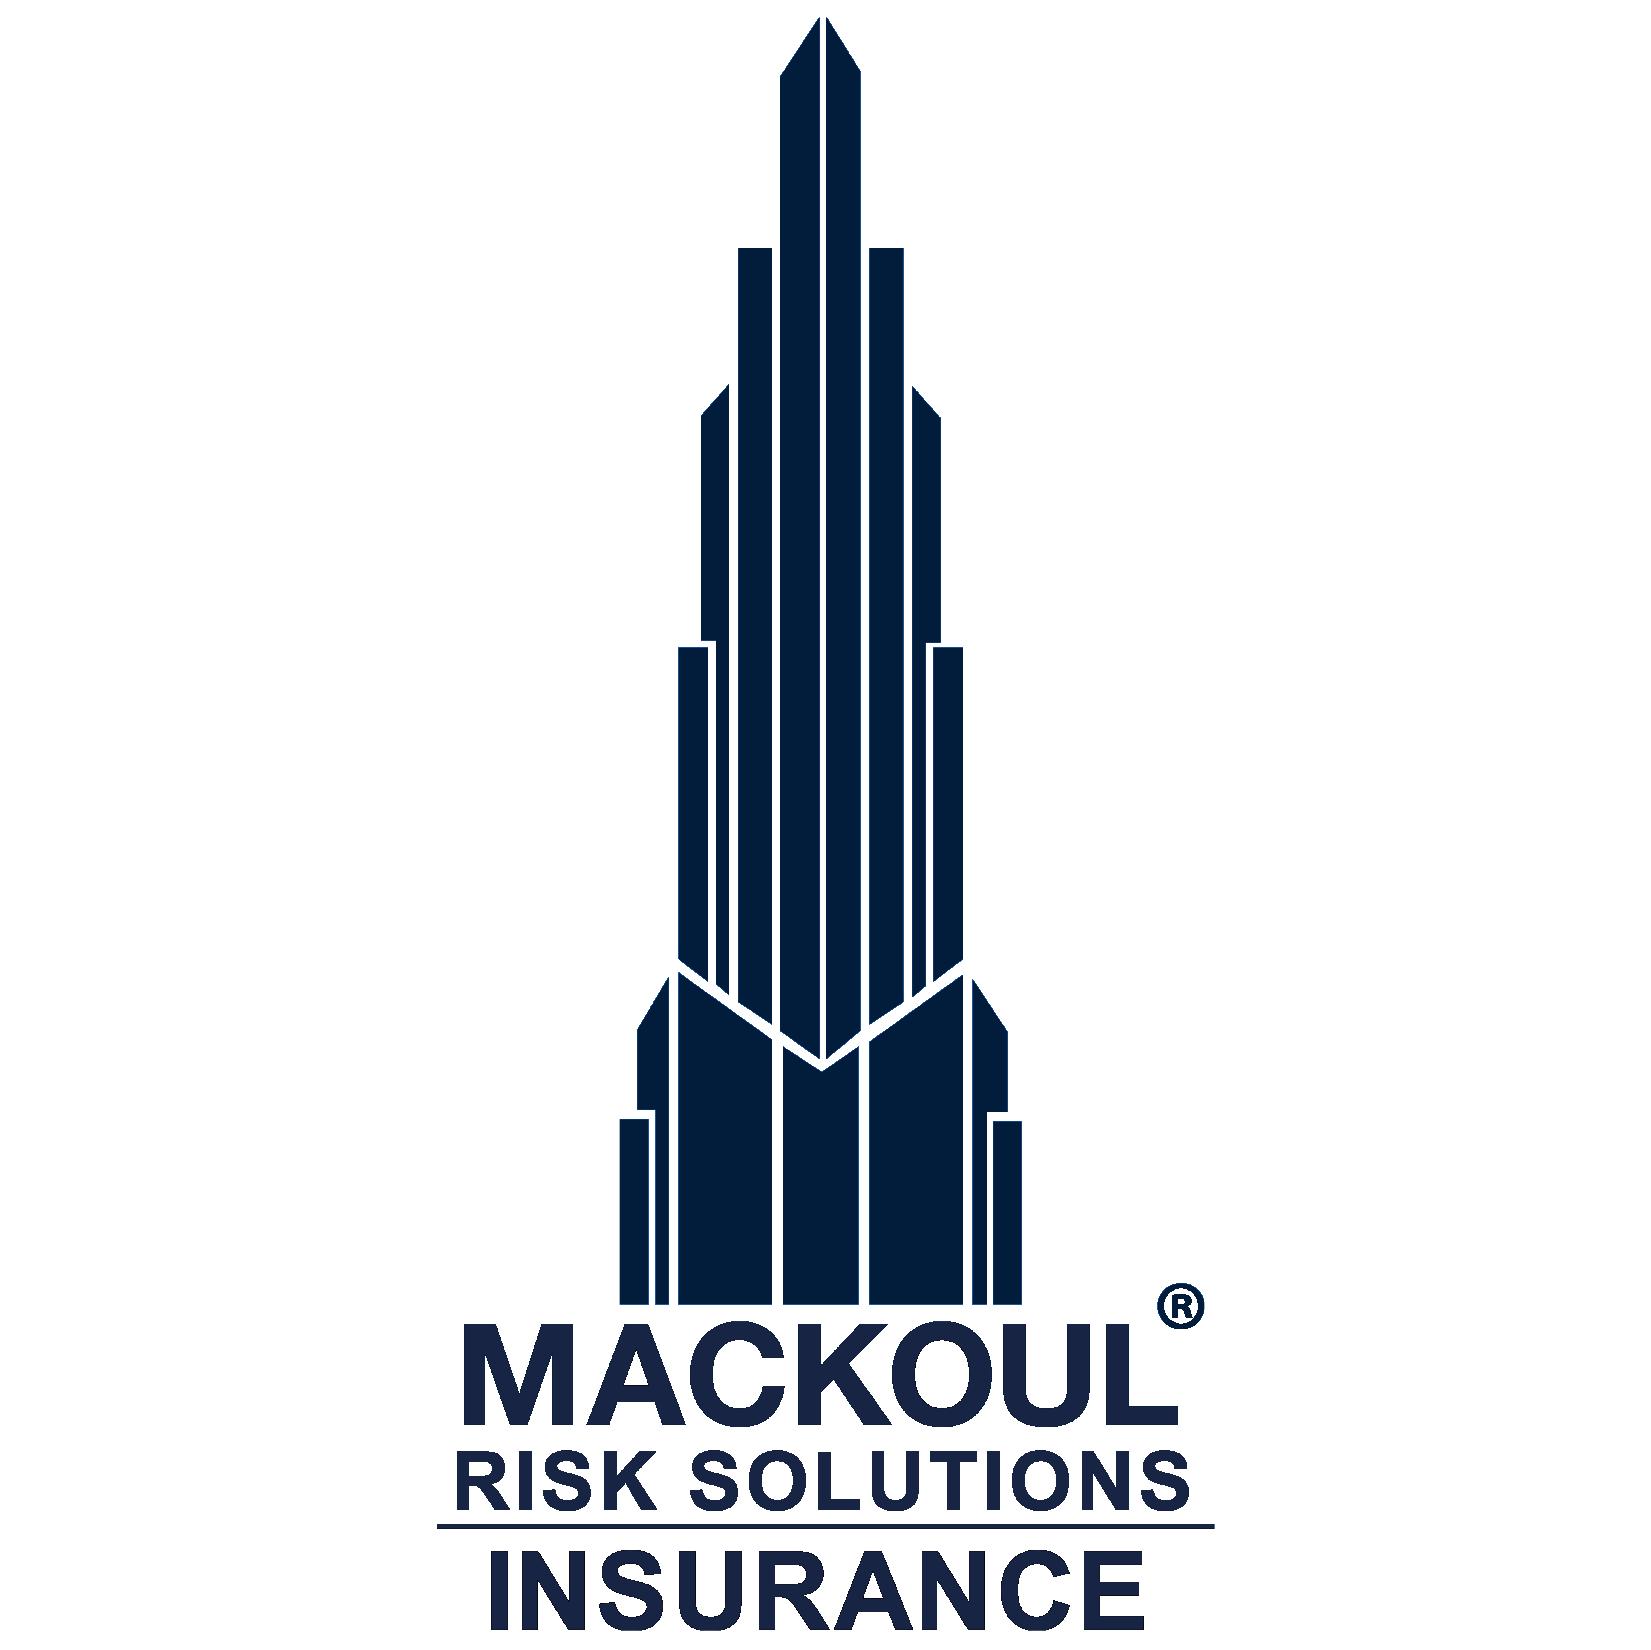 Mackoul Risk Solutions, LLC